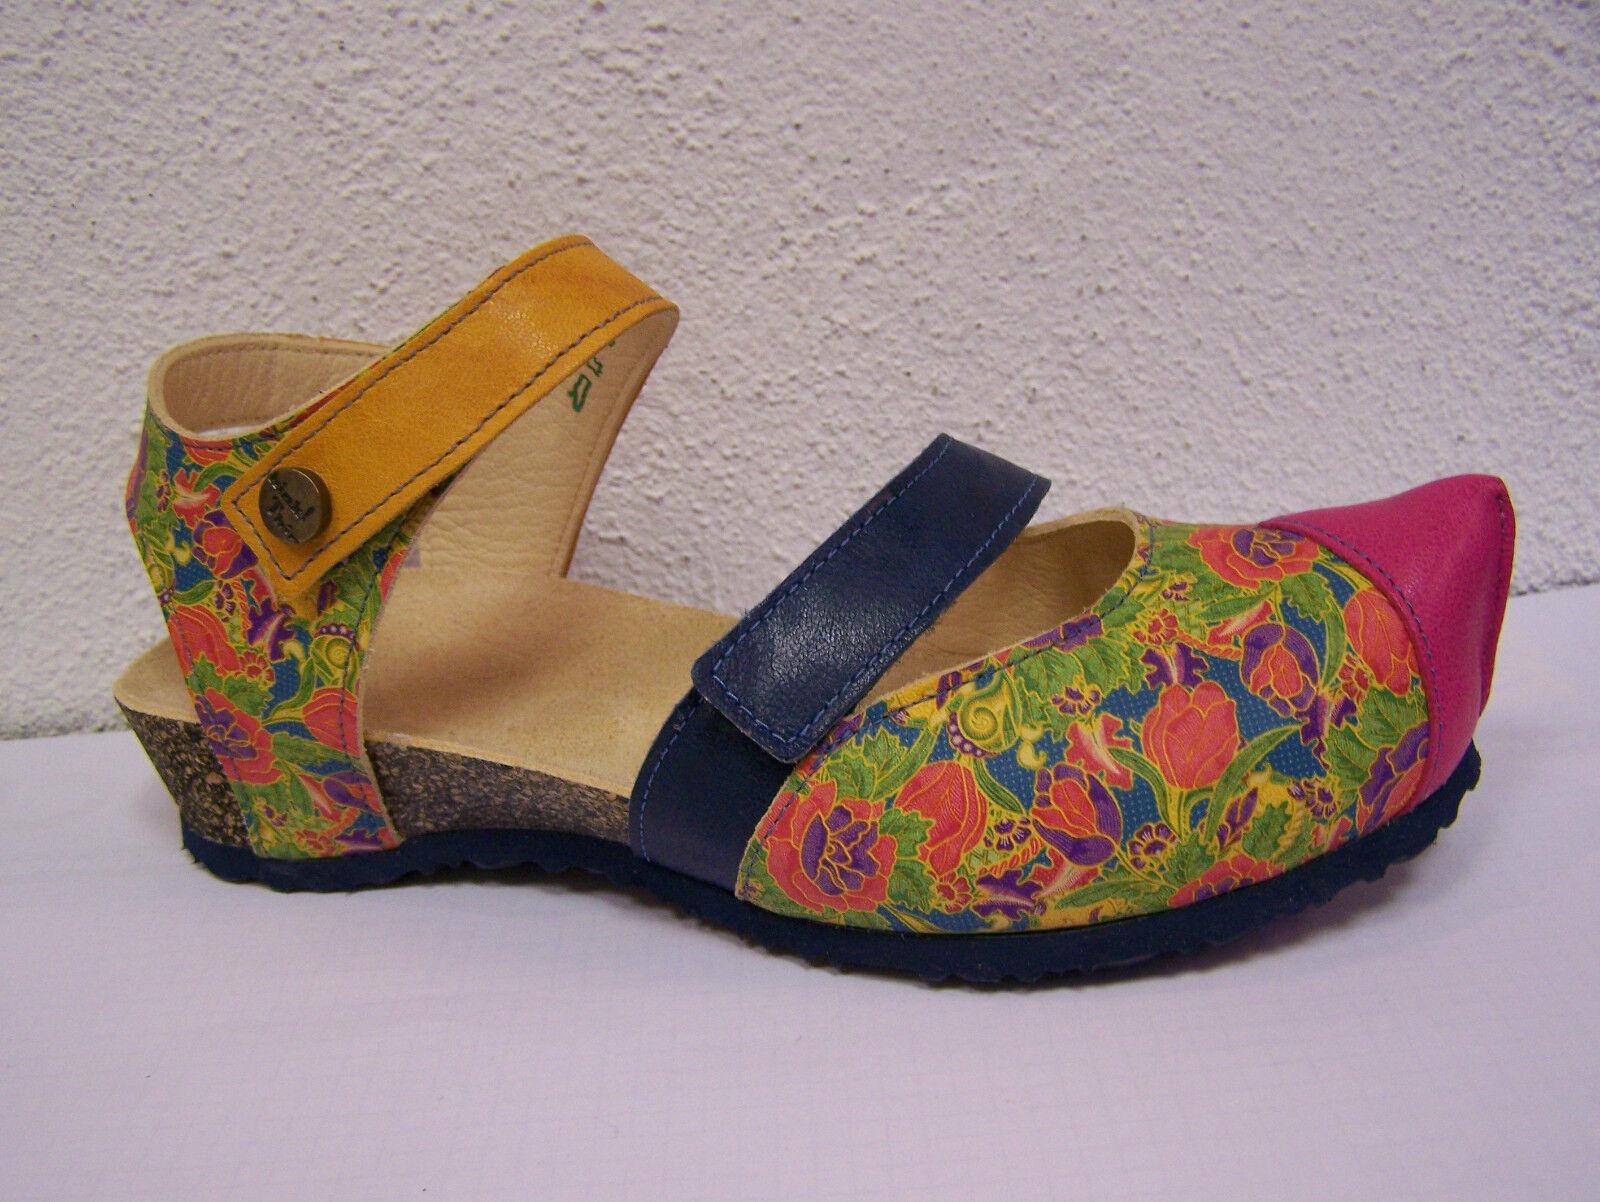 Think Kessy,  Pantolette fällt größer aus  Kessy, Blumenprint multicolor capra rustico 0a6c62